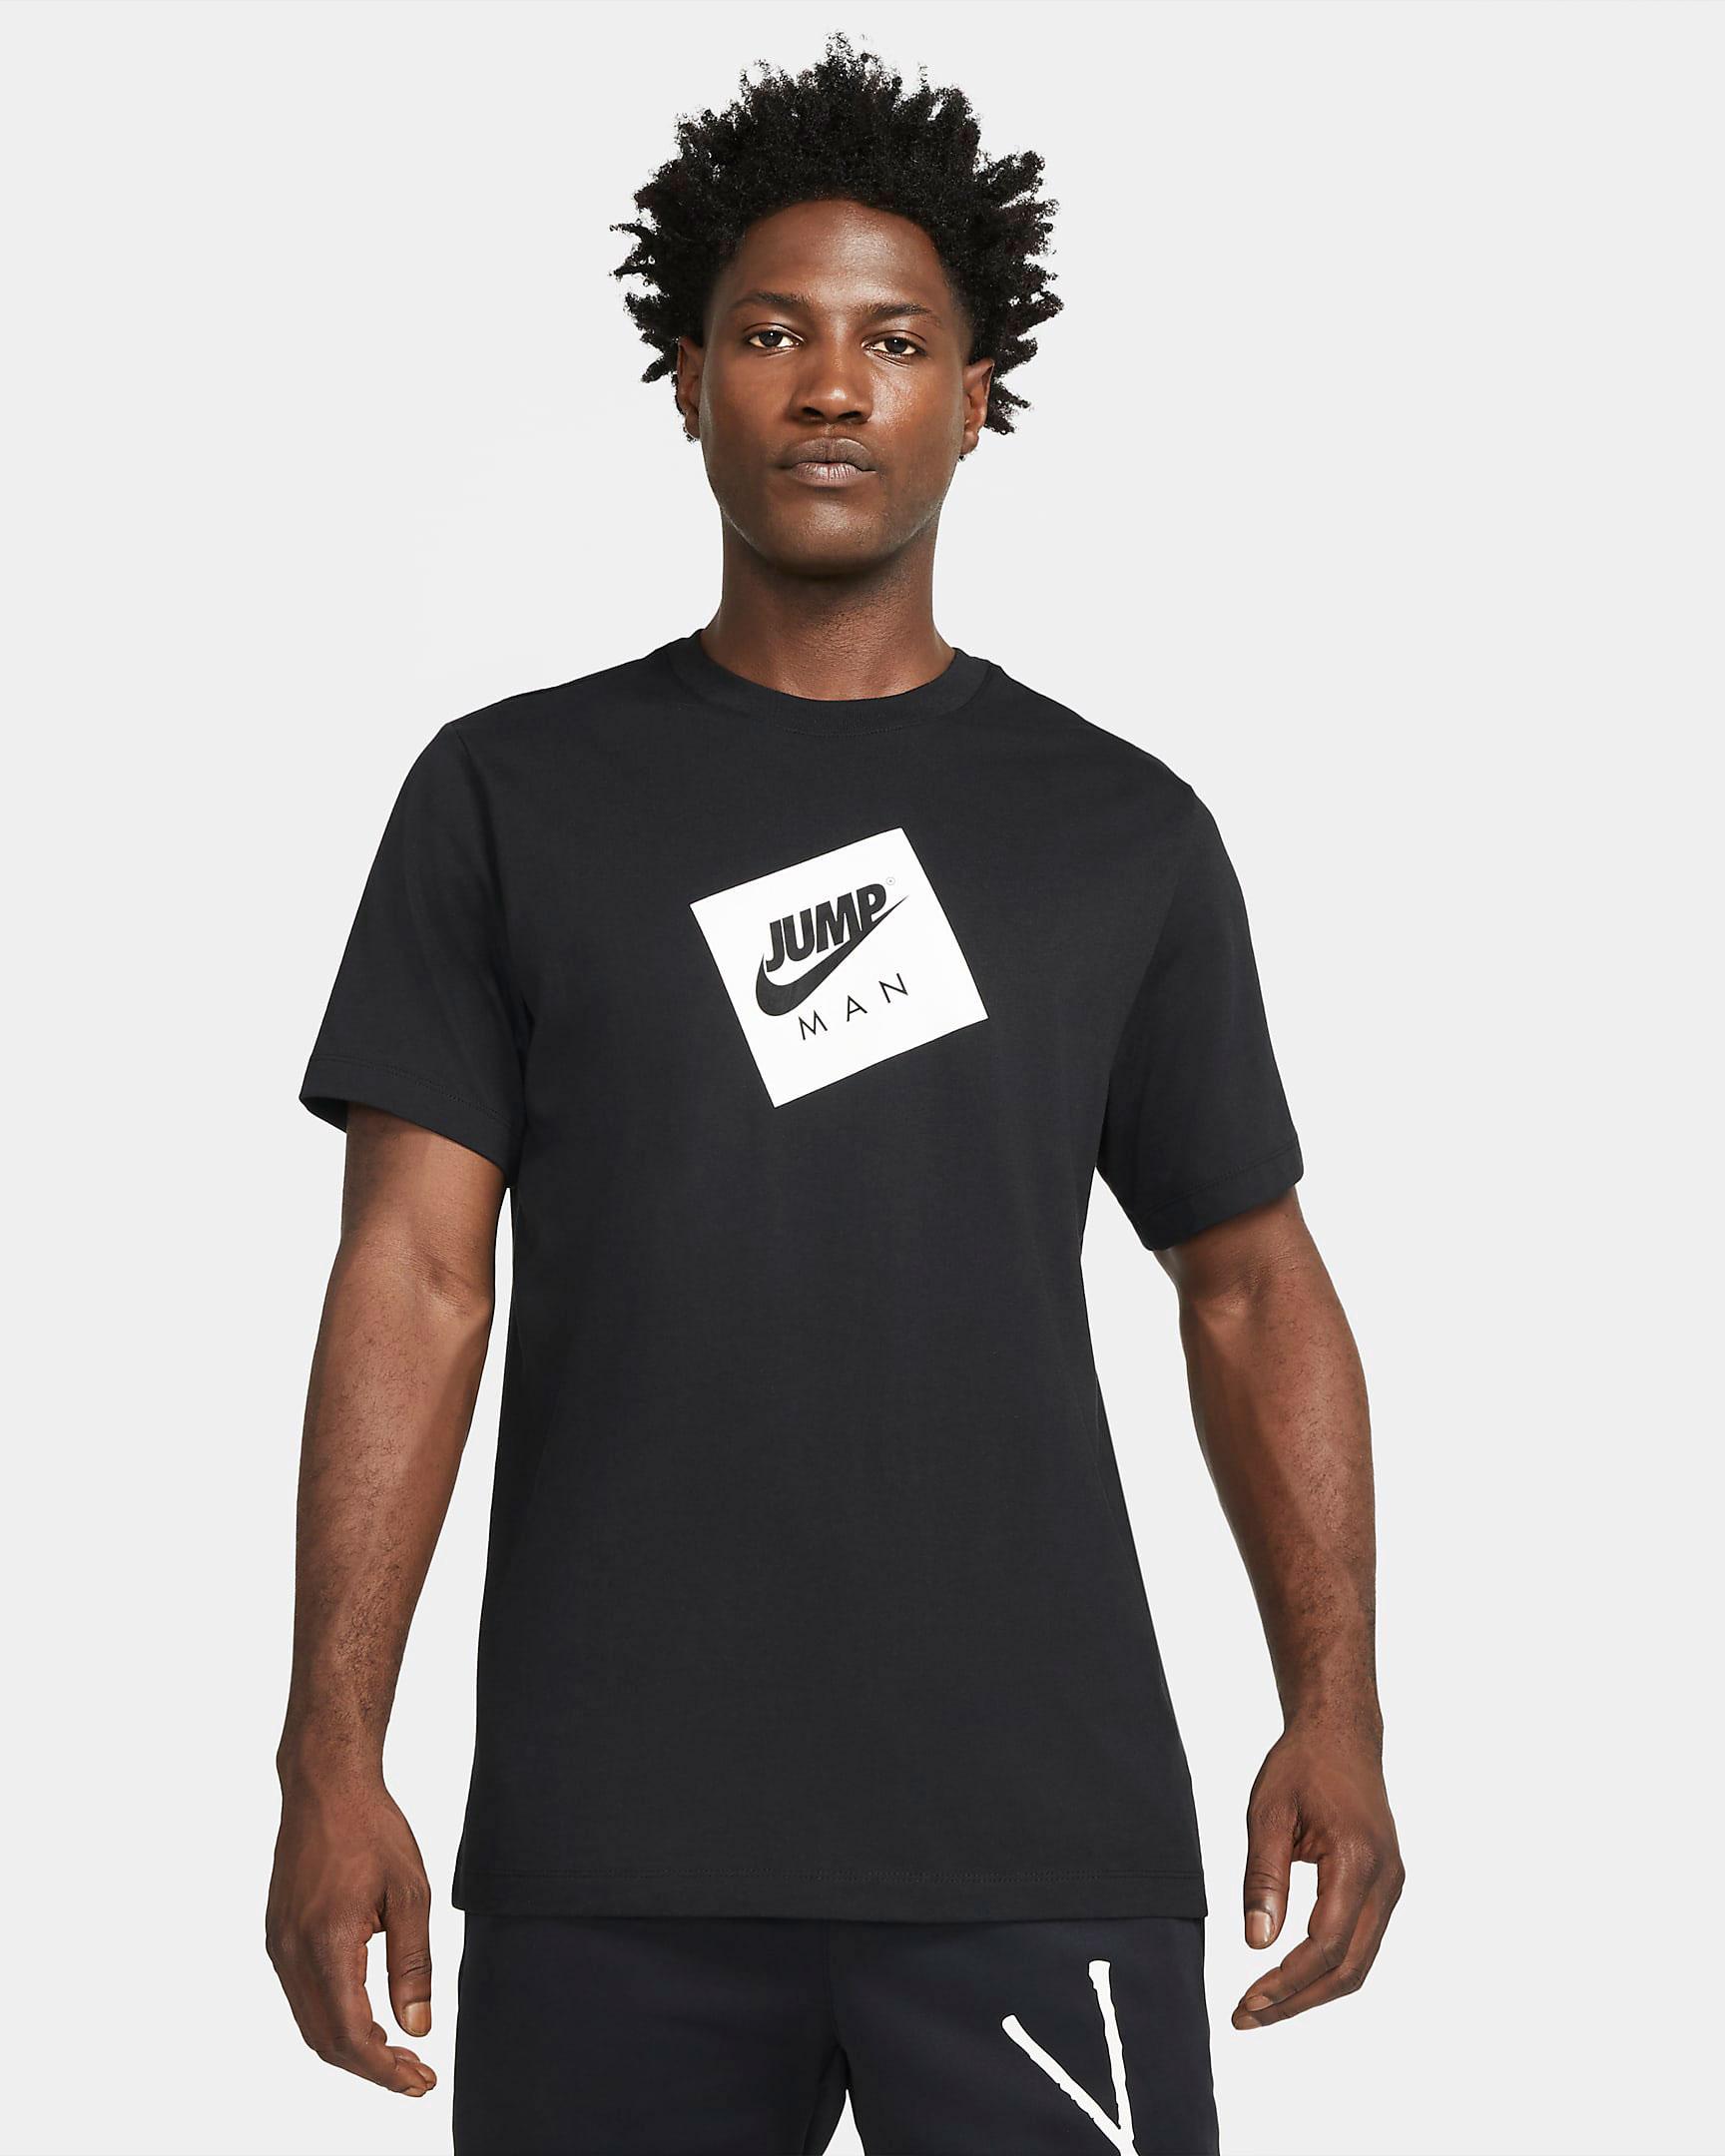 jordan-11-jubilee-black-white-tee-shirt-match